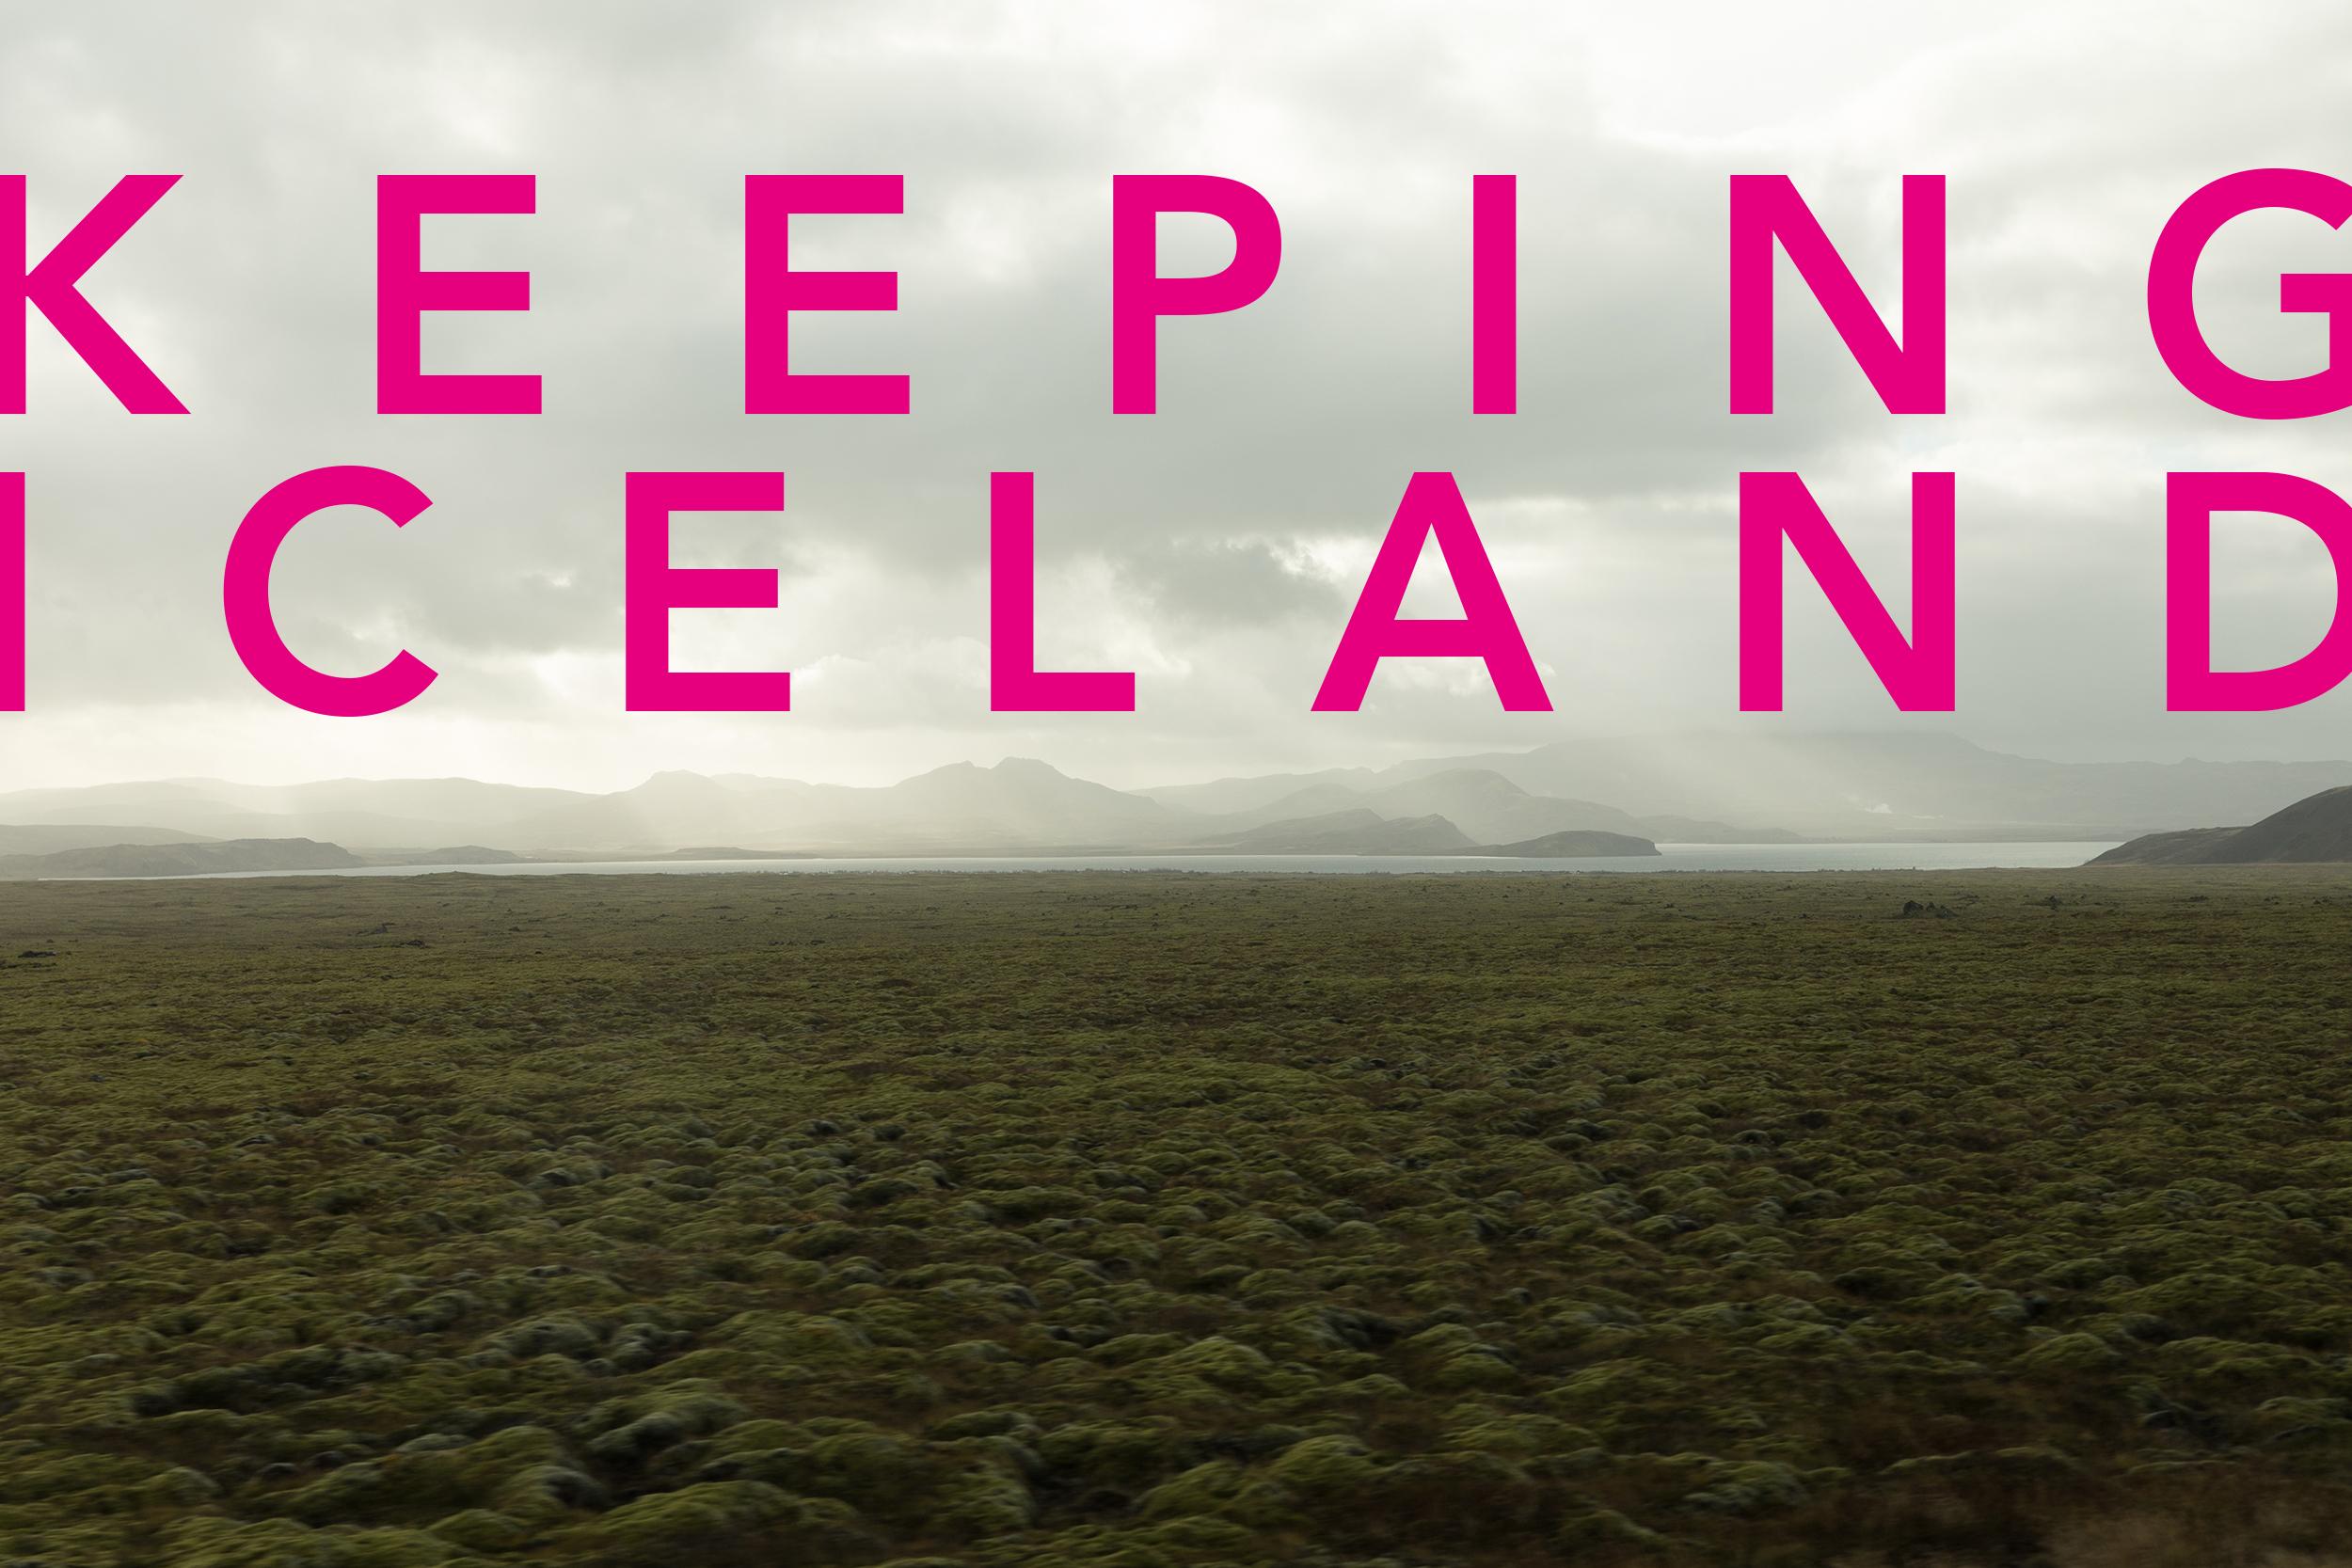 KEEPING_ICELAND_TITLE.jpg